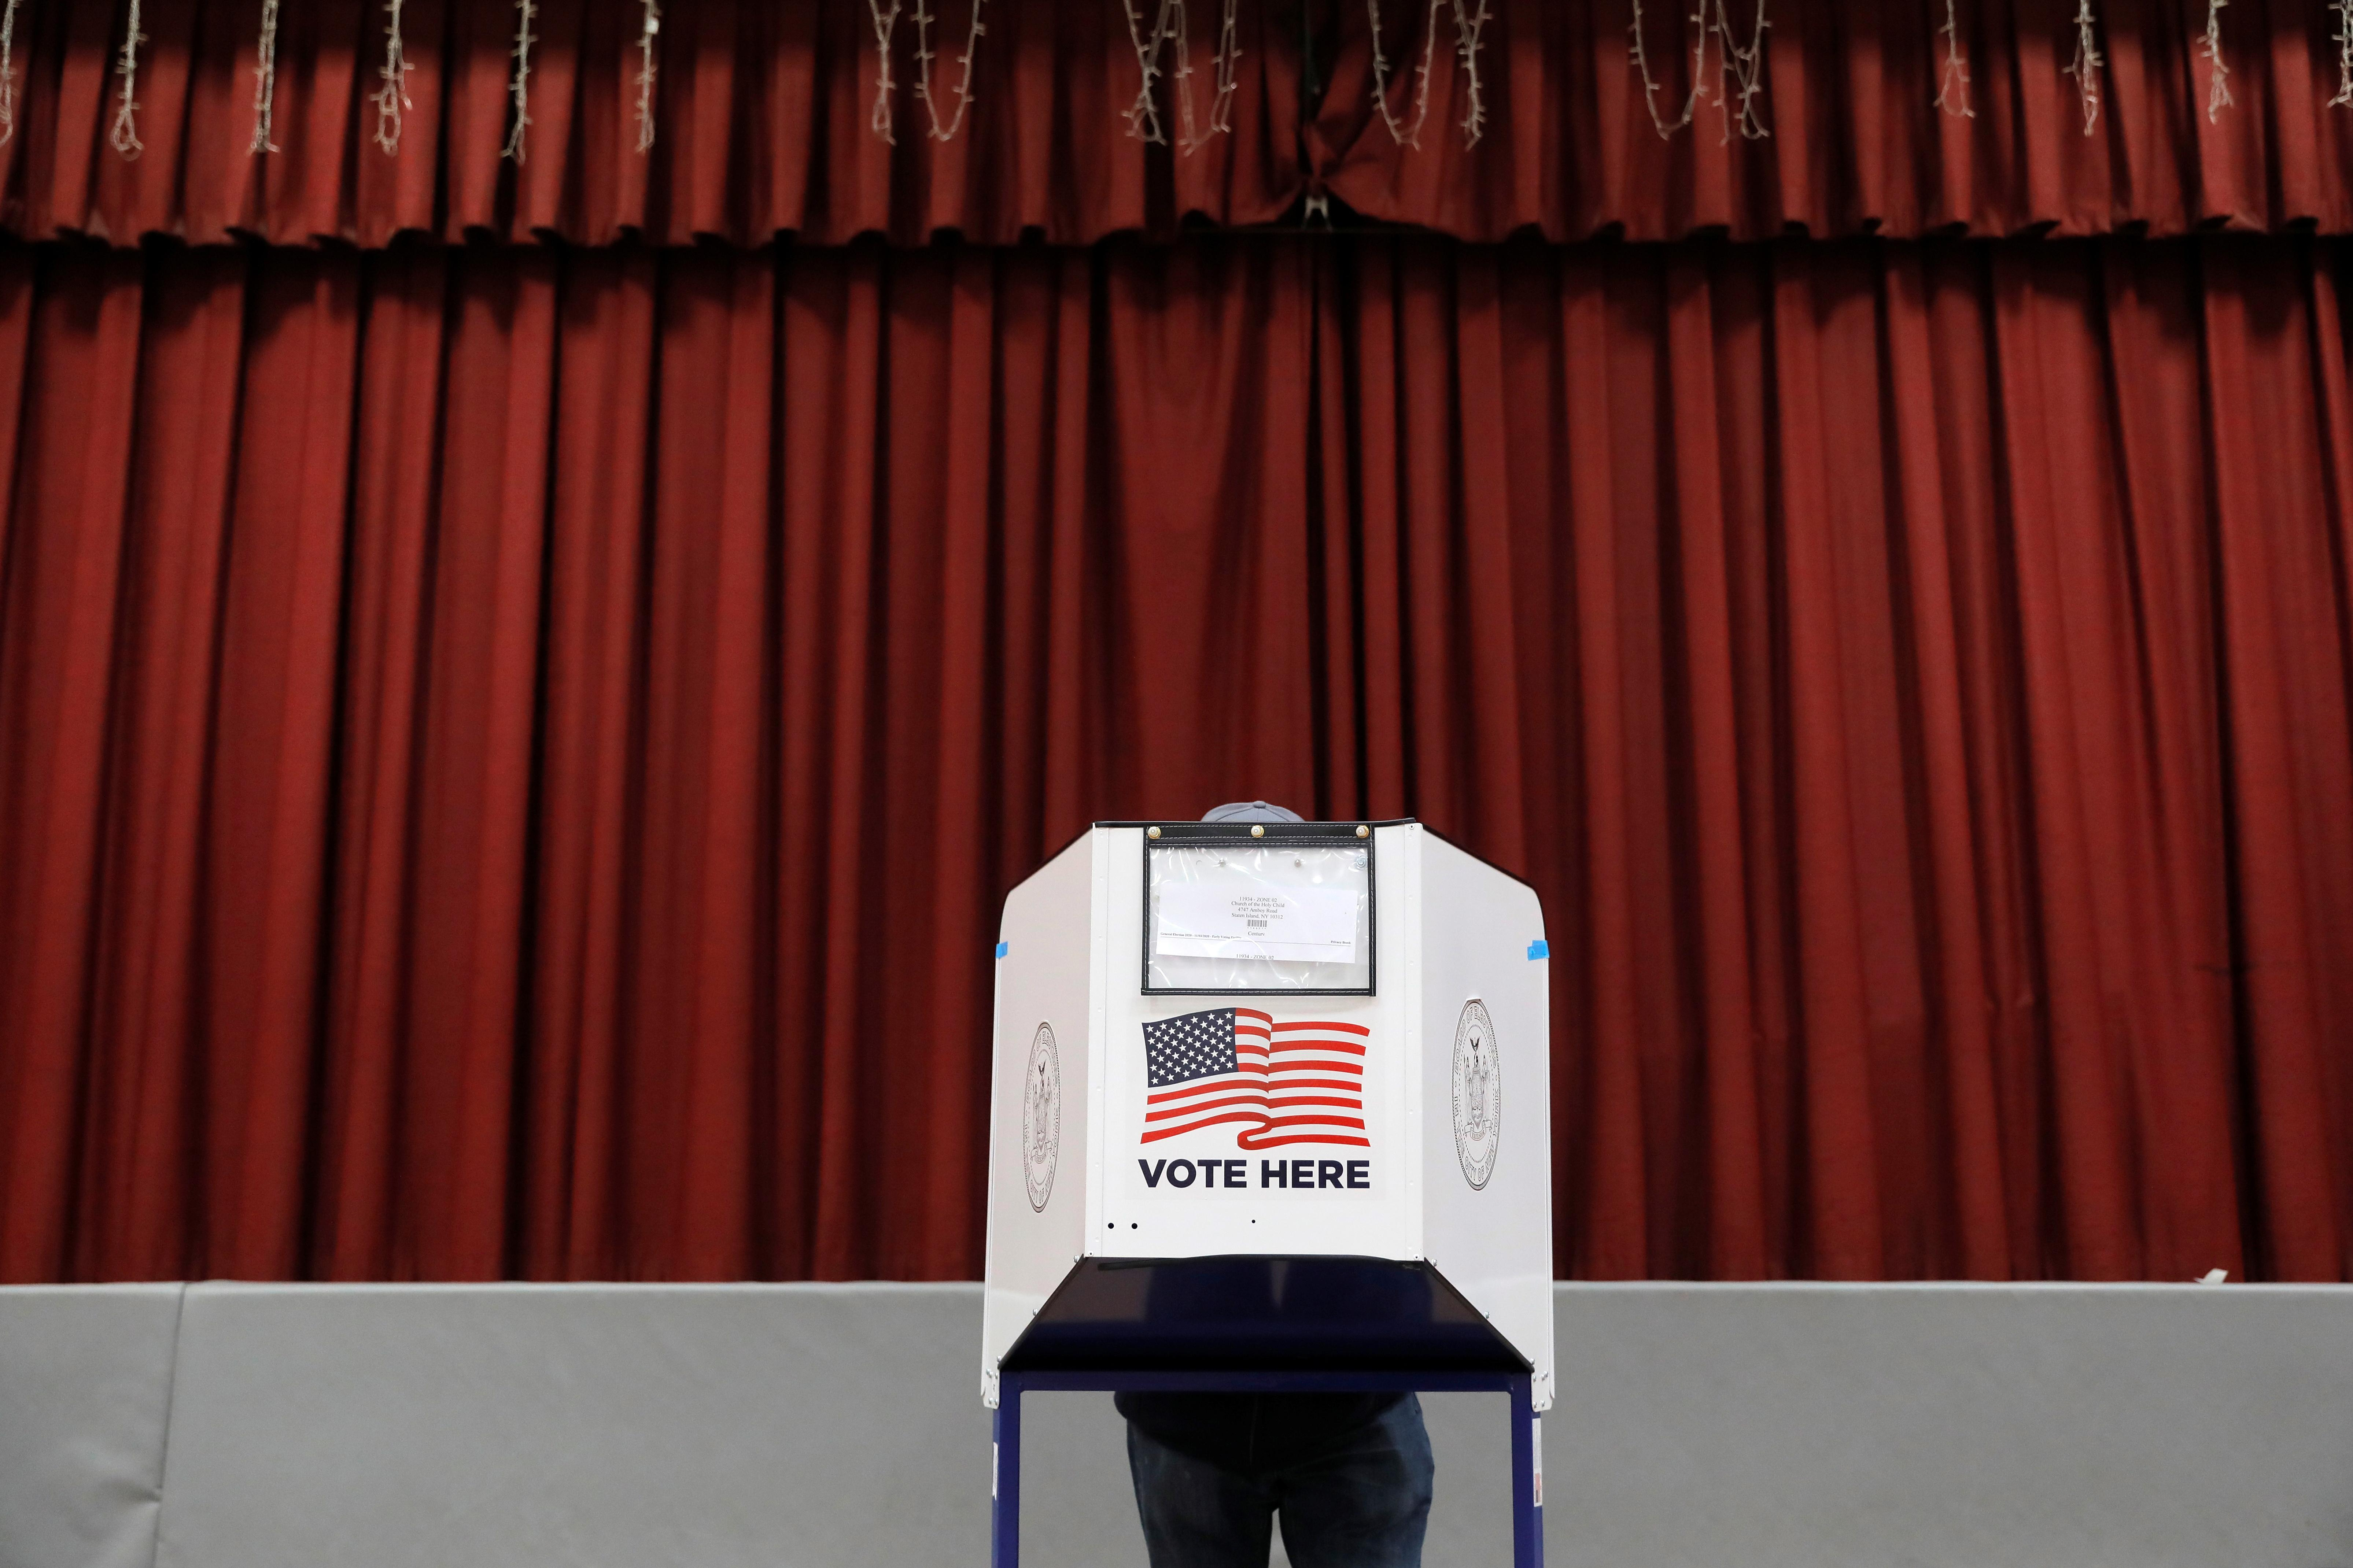 U.S. felons still face barriers after regaining vote